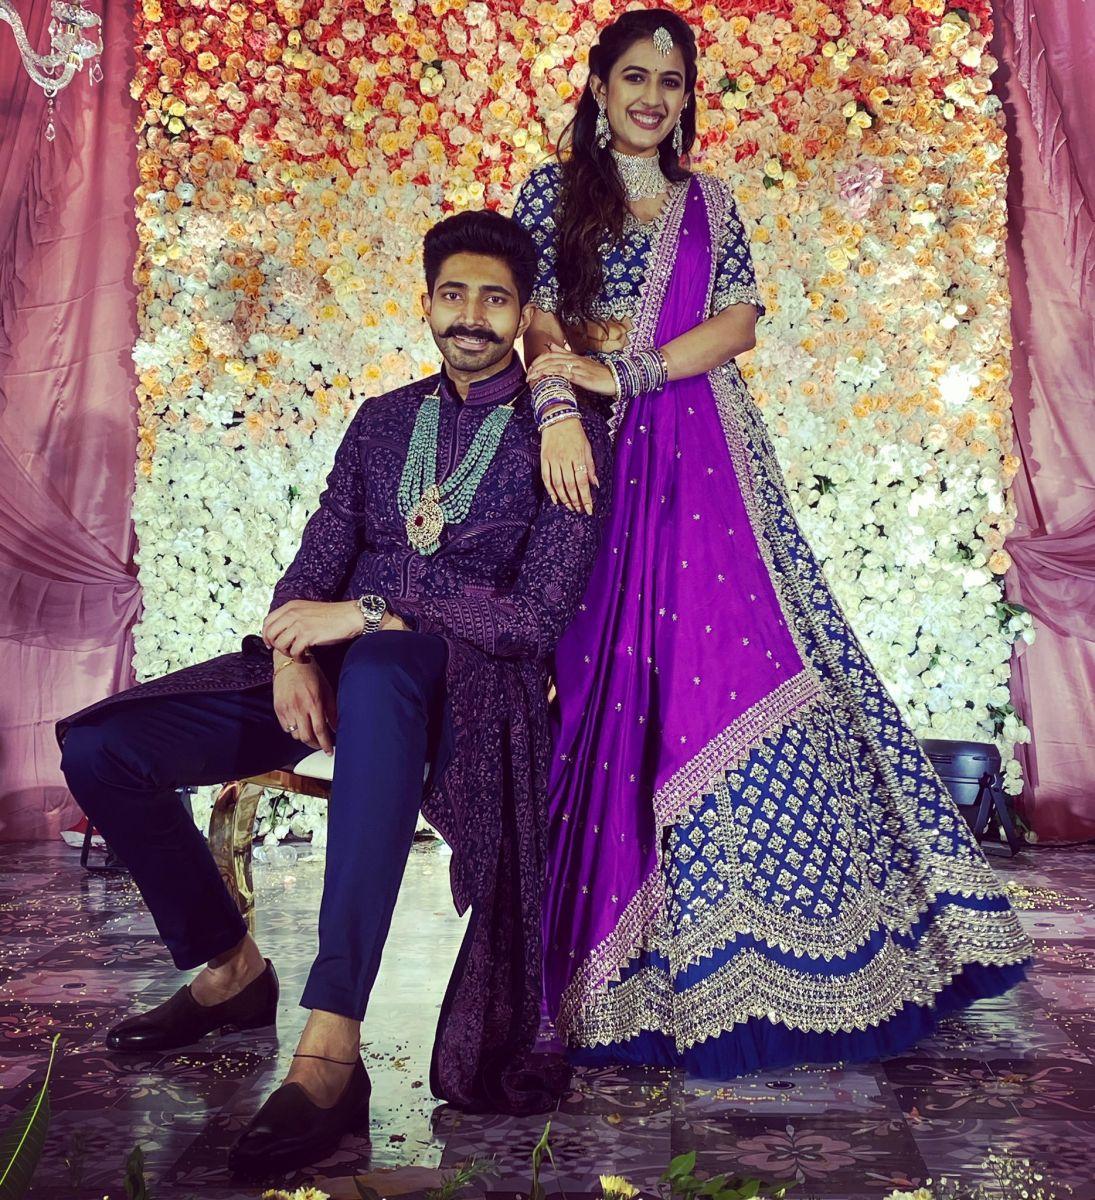 In Pics Actor Niharika Konidela Engaged To Business Strategist Chaitanya Jonnalagadda The News Minute